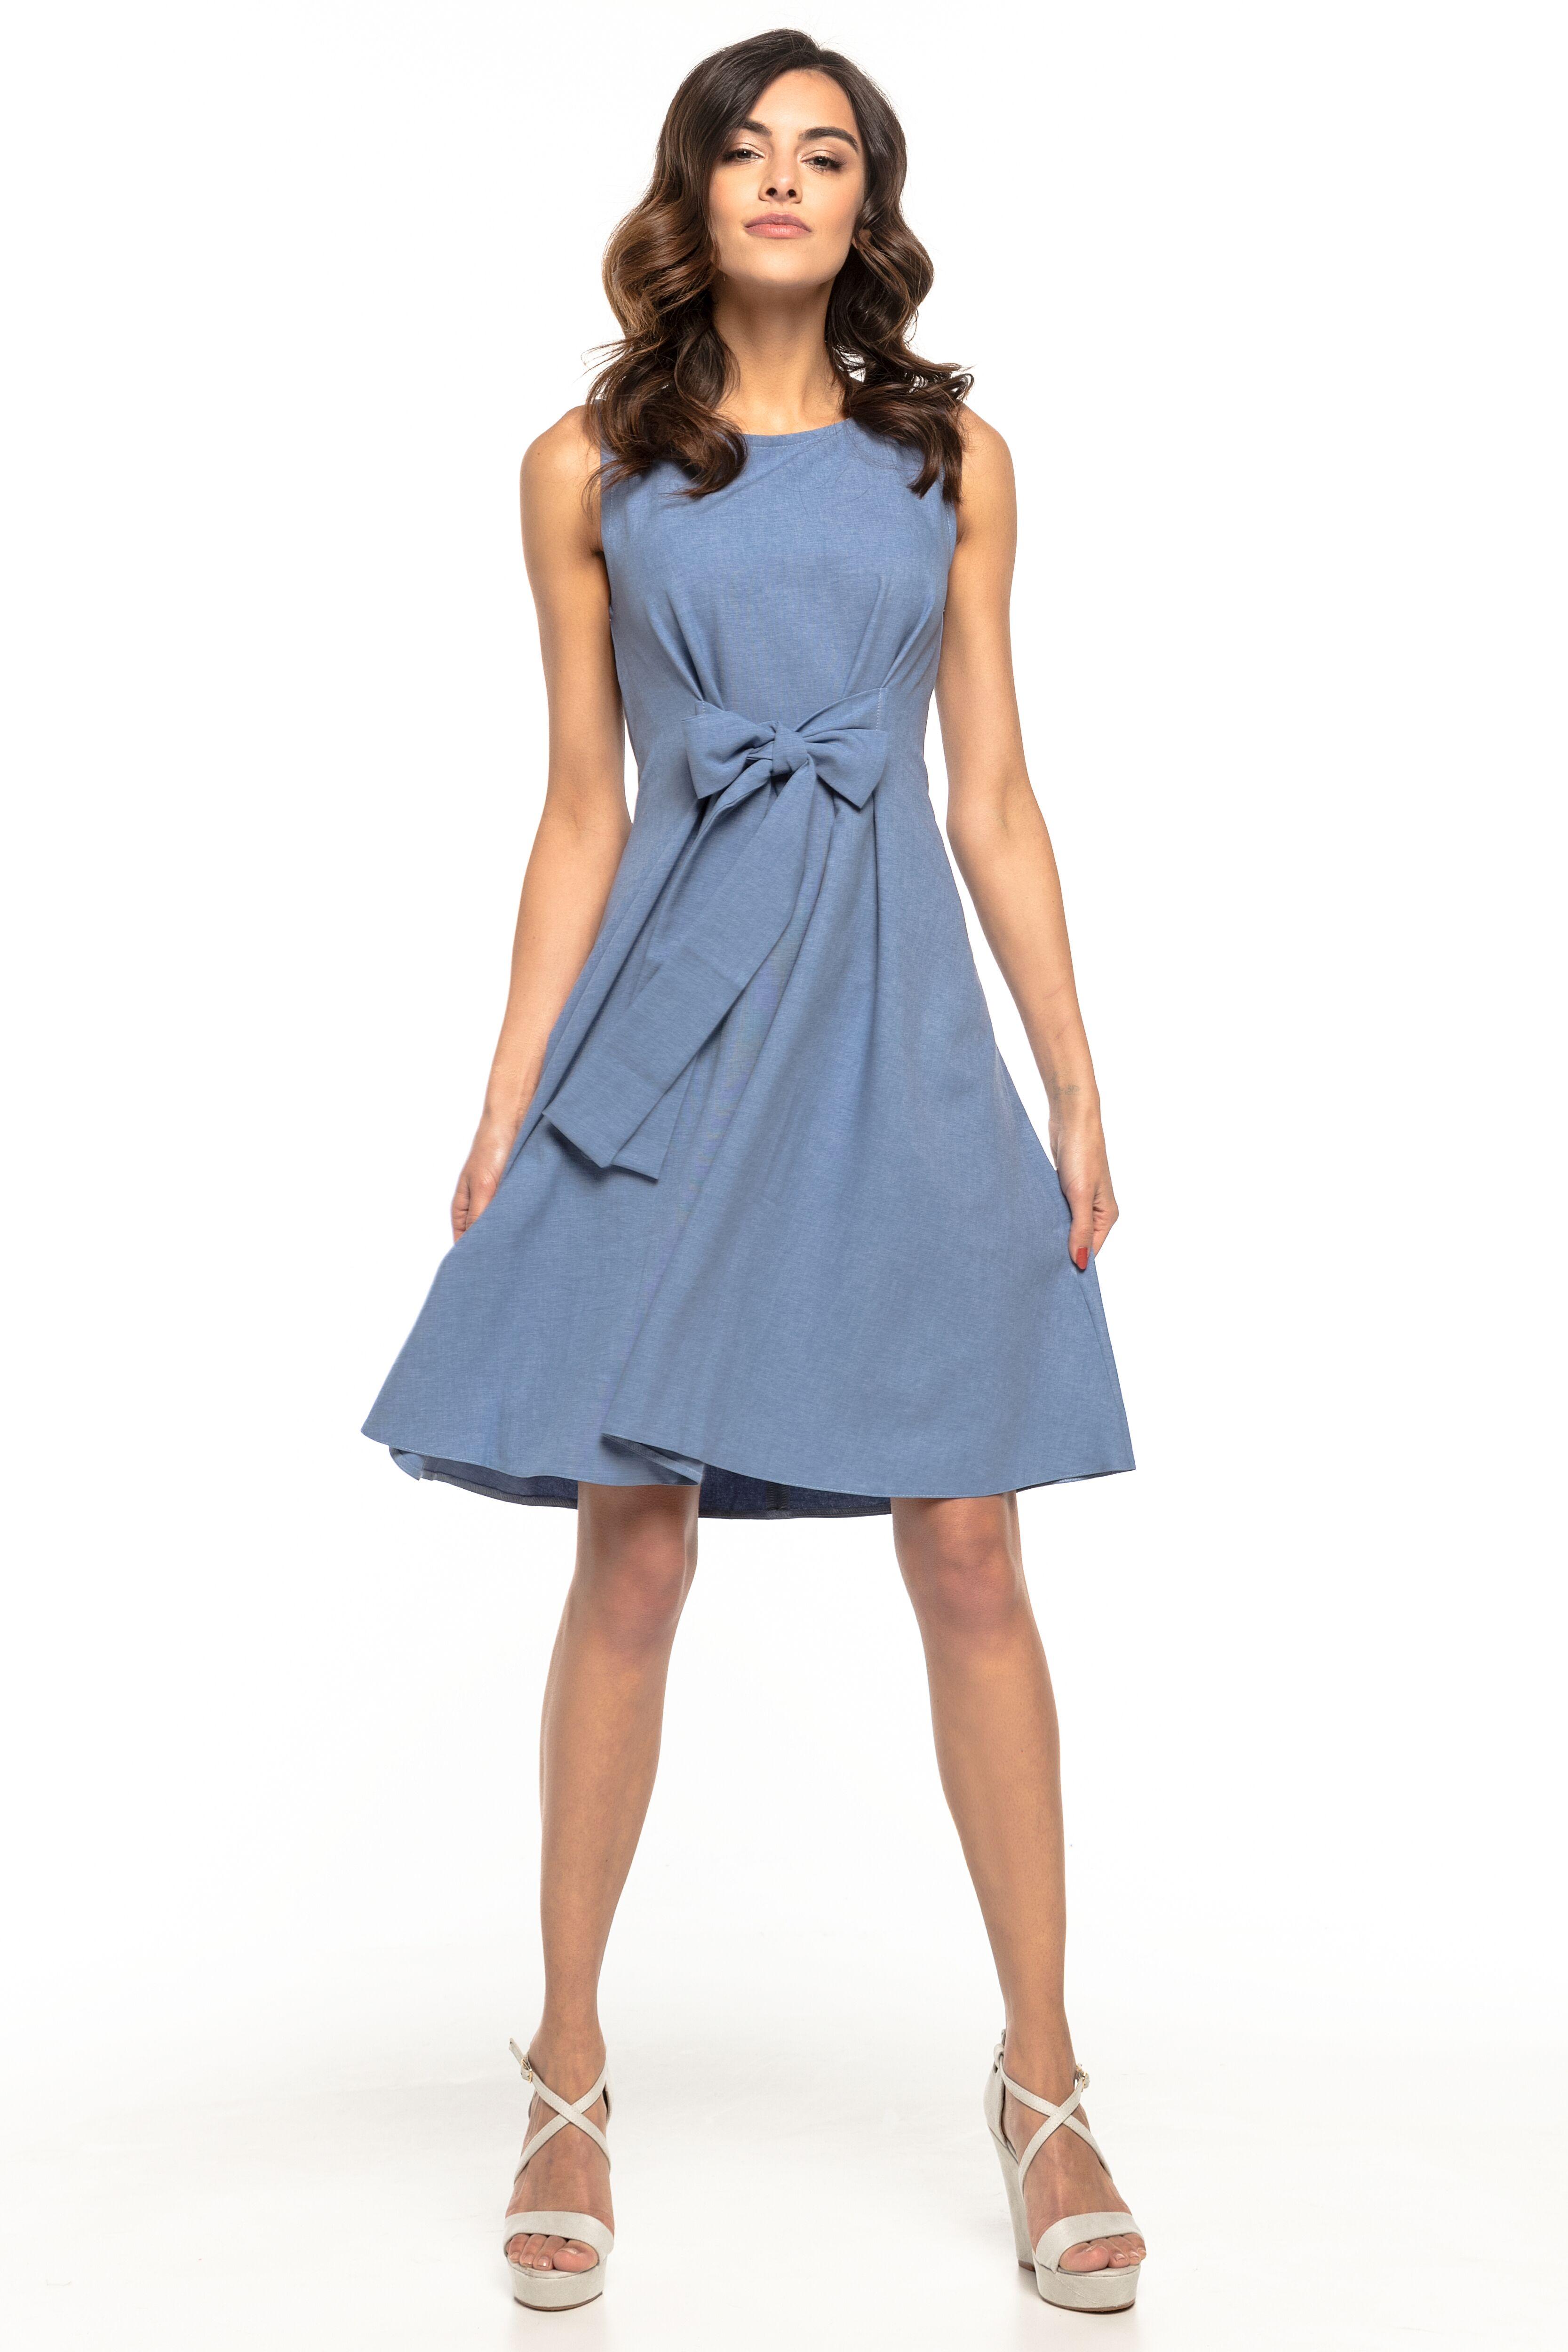 d230fced4b Sukienka rozkloszowana bez rękawów niebieska - tani kurier już od 5 ...